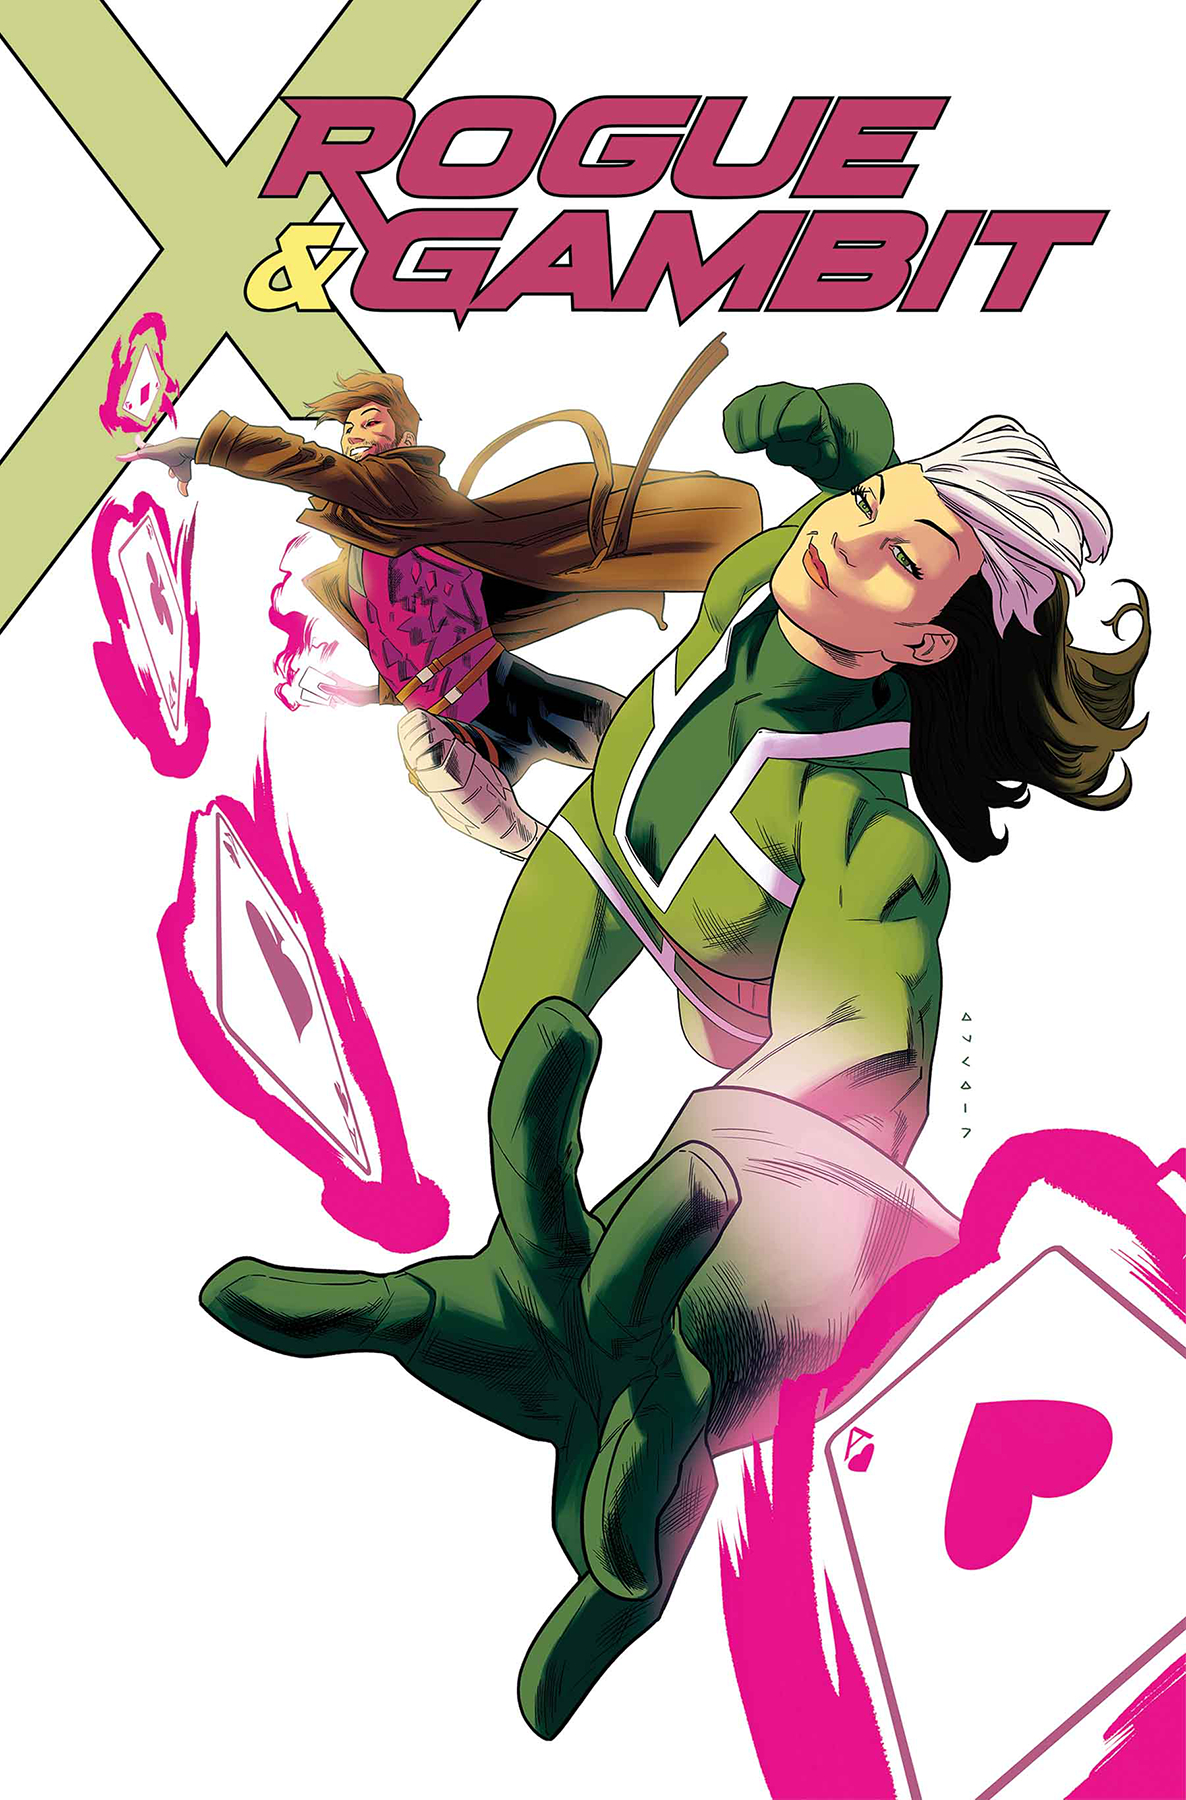 Kris Anka - Rogue & Gambit #1 cover